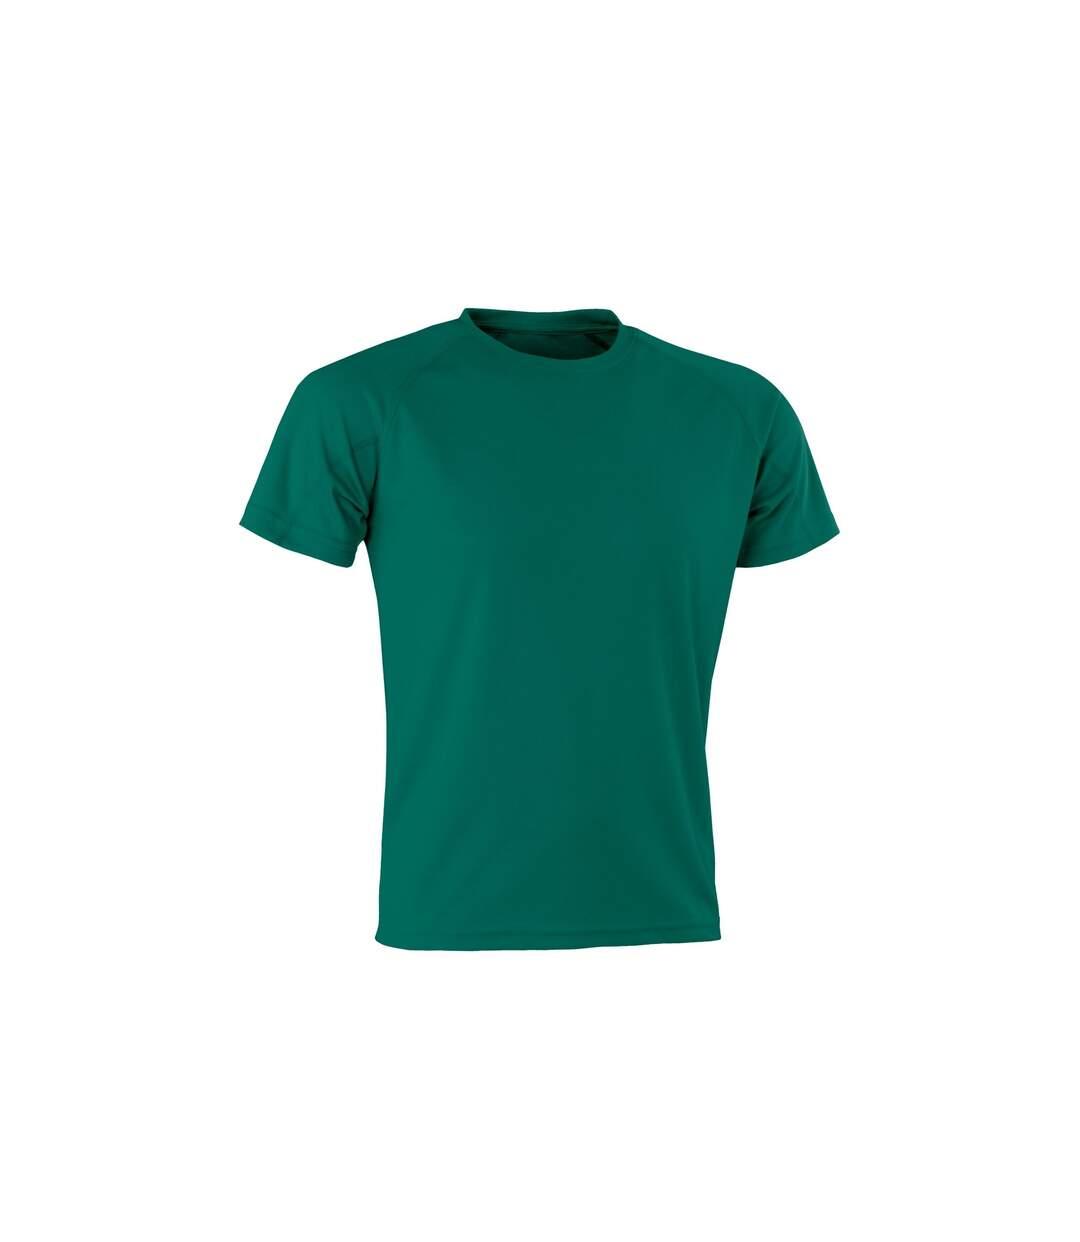 Spiro Mens Aircool T-Shirt (Bottle) - UTPC3166